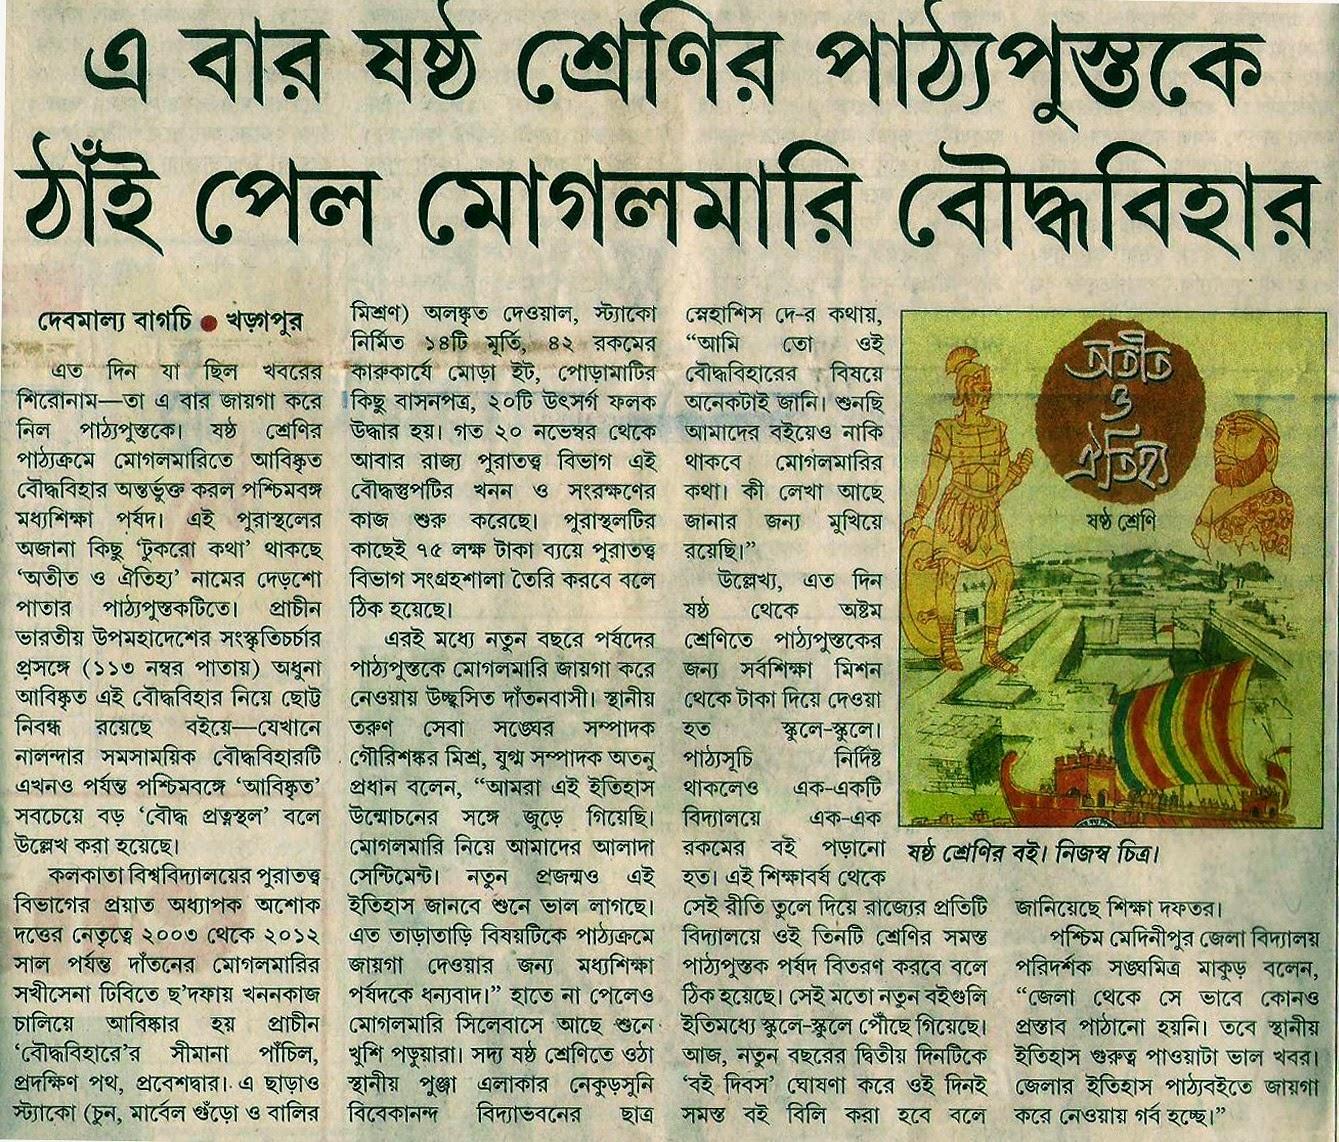 anandabazar patrika today bengali news